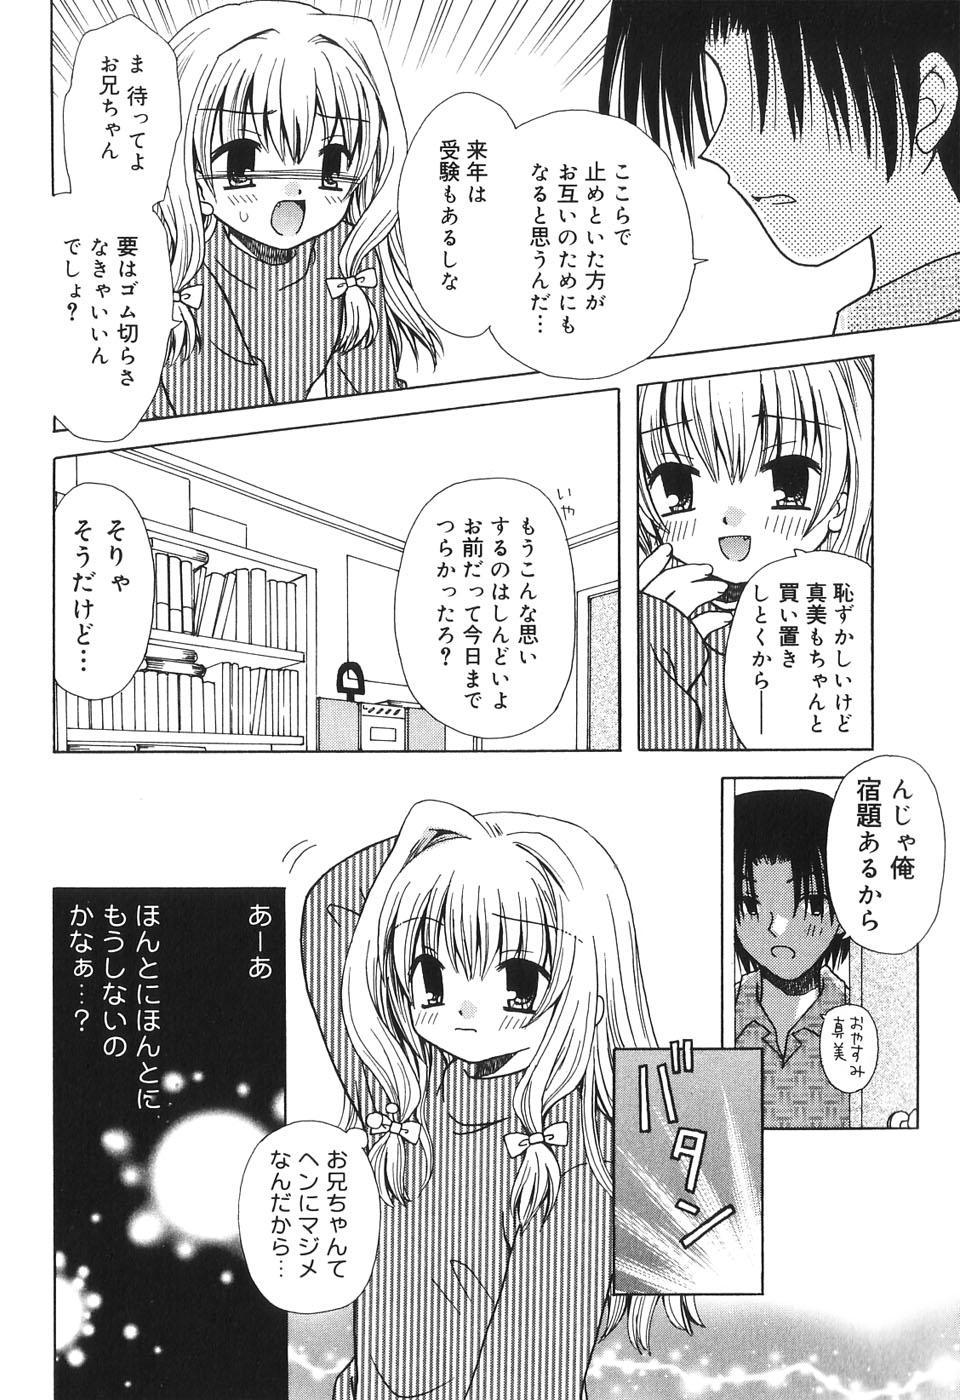 Musoubana 136